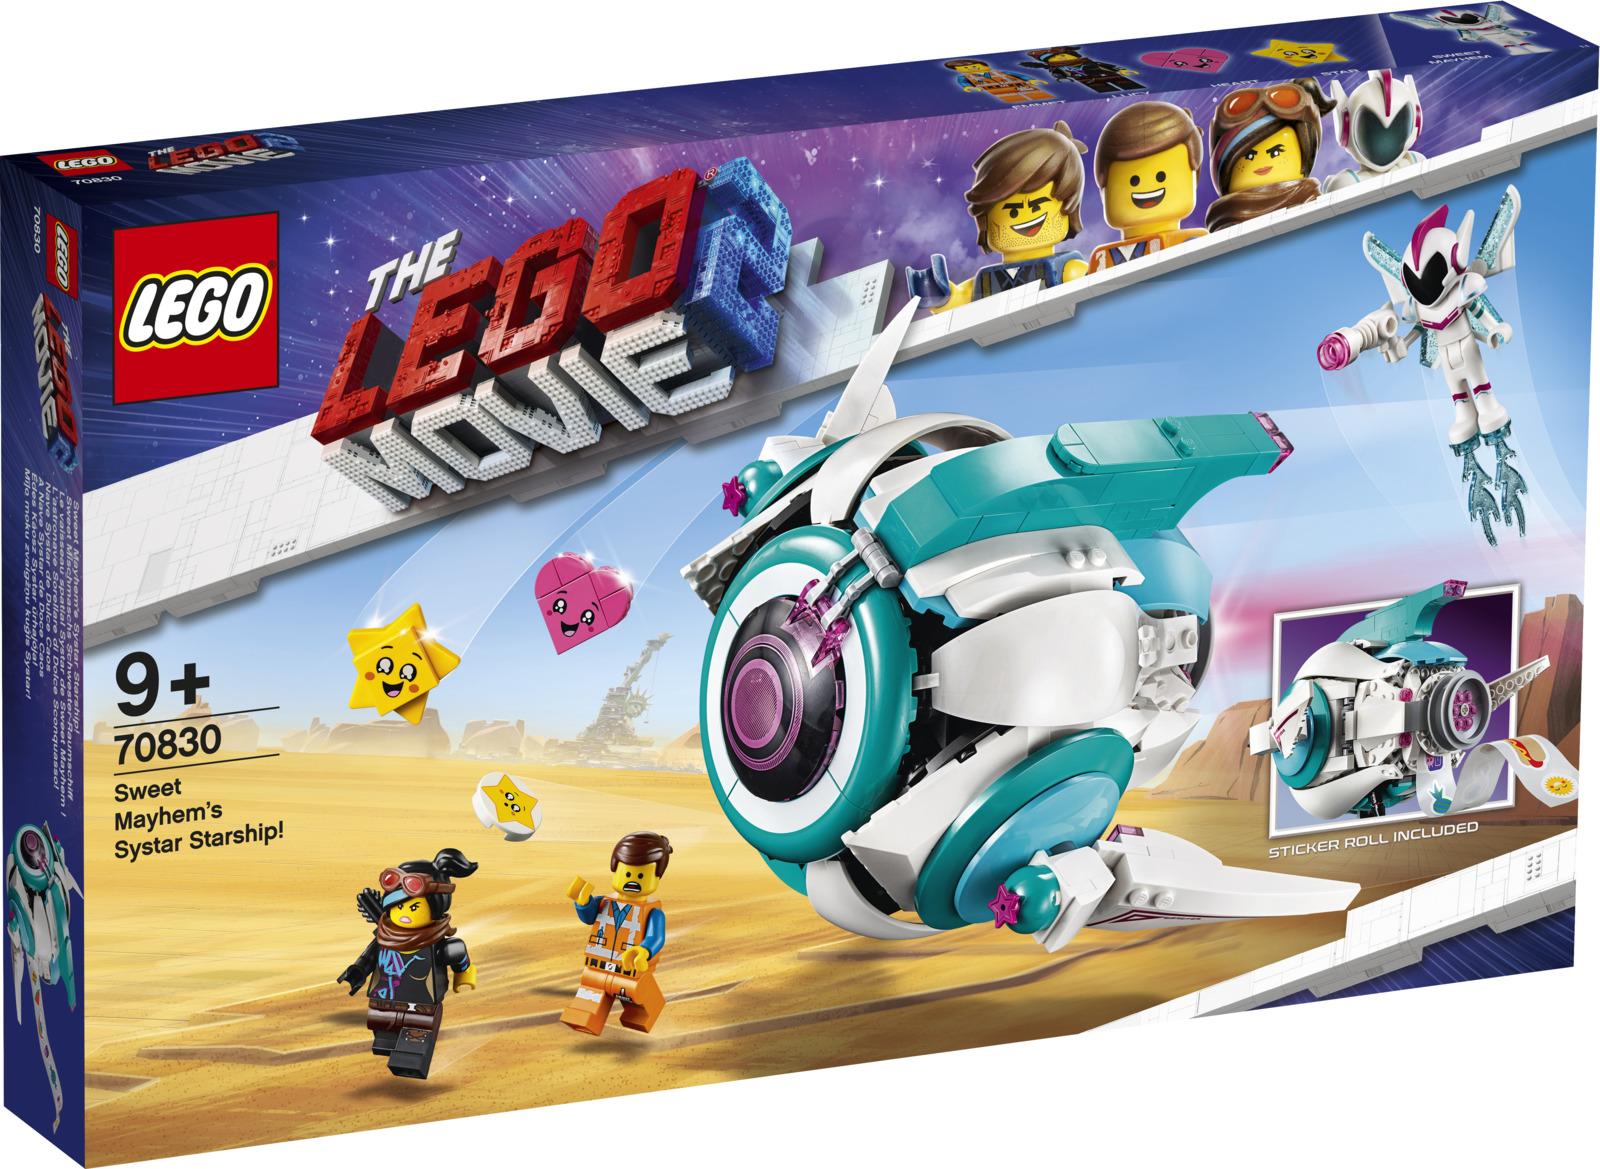 LEGO Movie 2 70830 Падруженский Звездолет Мими Катавасии Конструктор конструктор lego ультра киса и воин люси 70827 lego movie 2